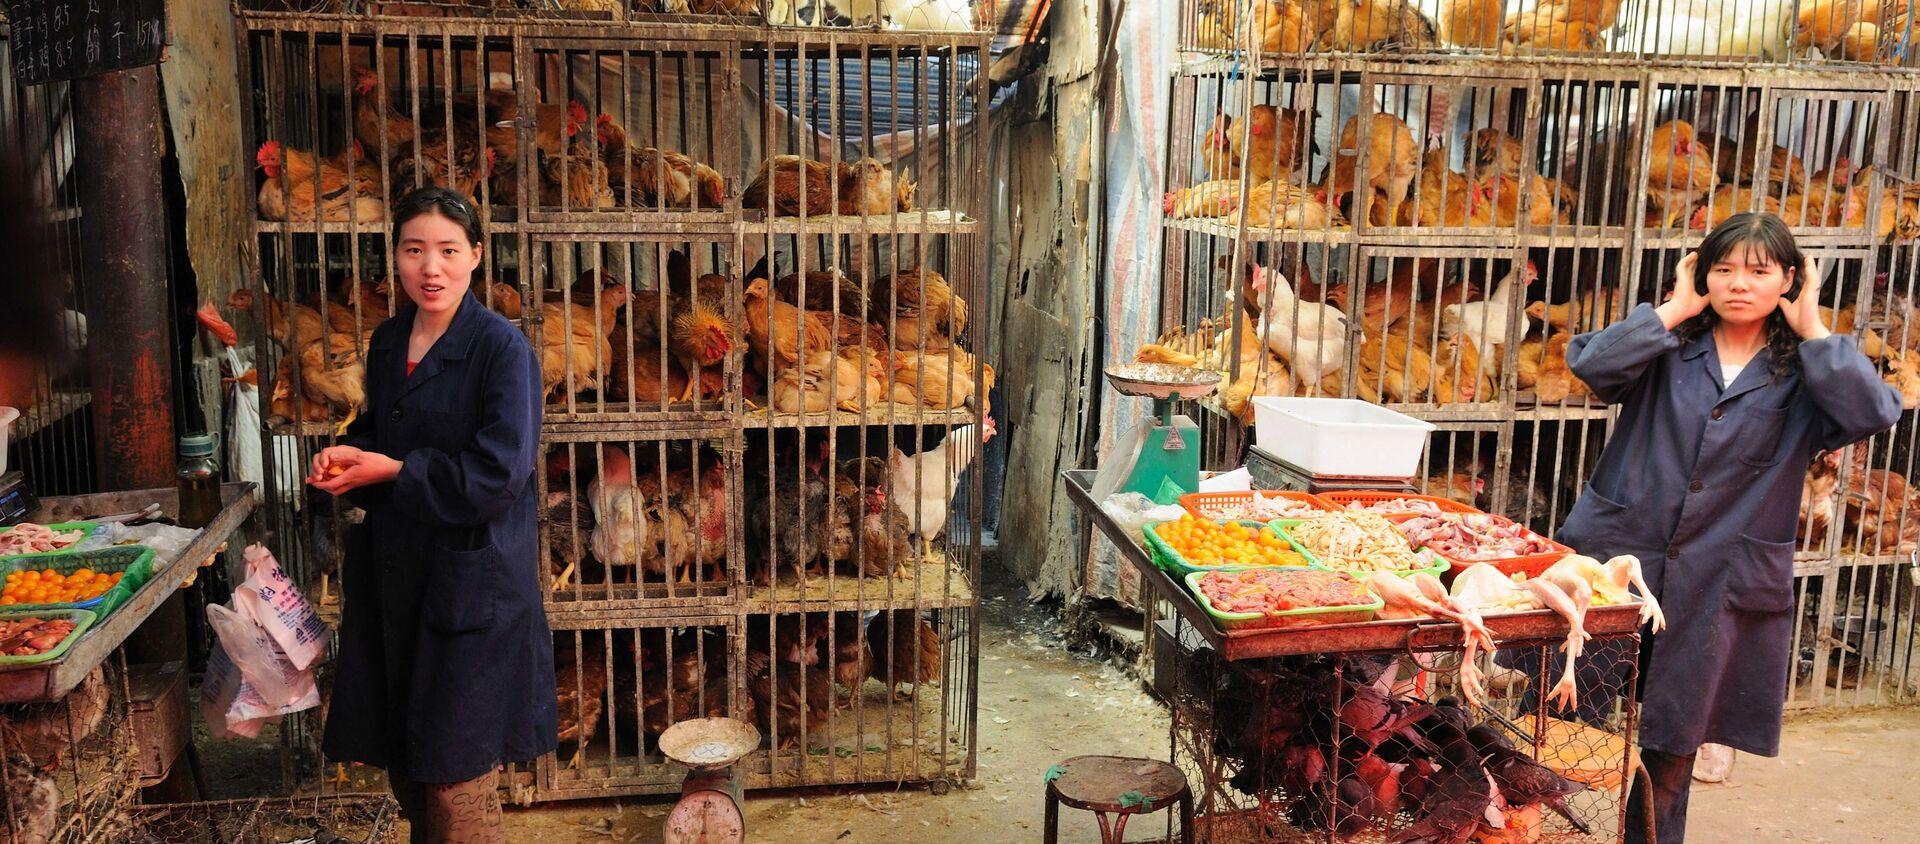 Un mercado de animales en Xining, China - Sputnik Mundo, 1920, 29.02.2020